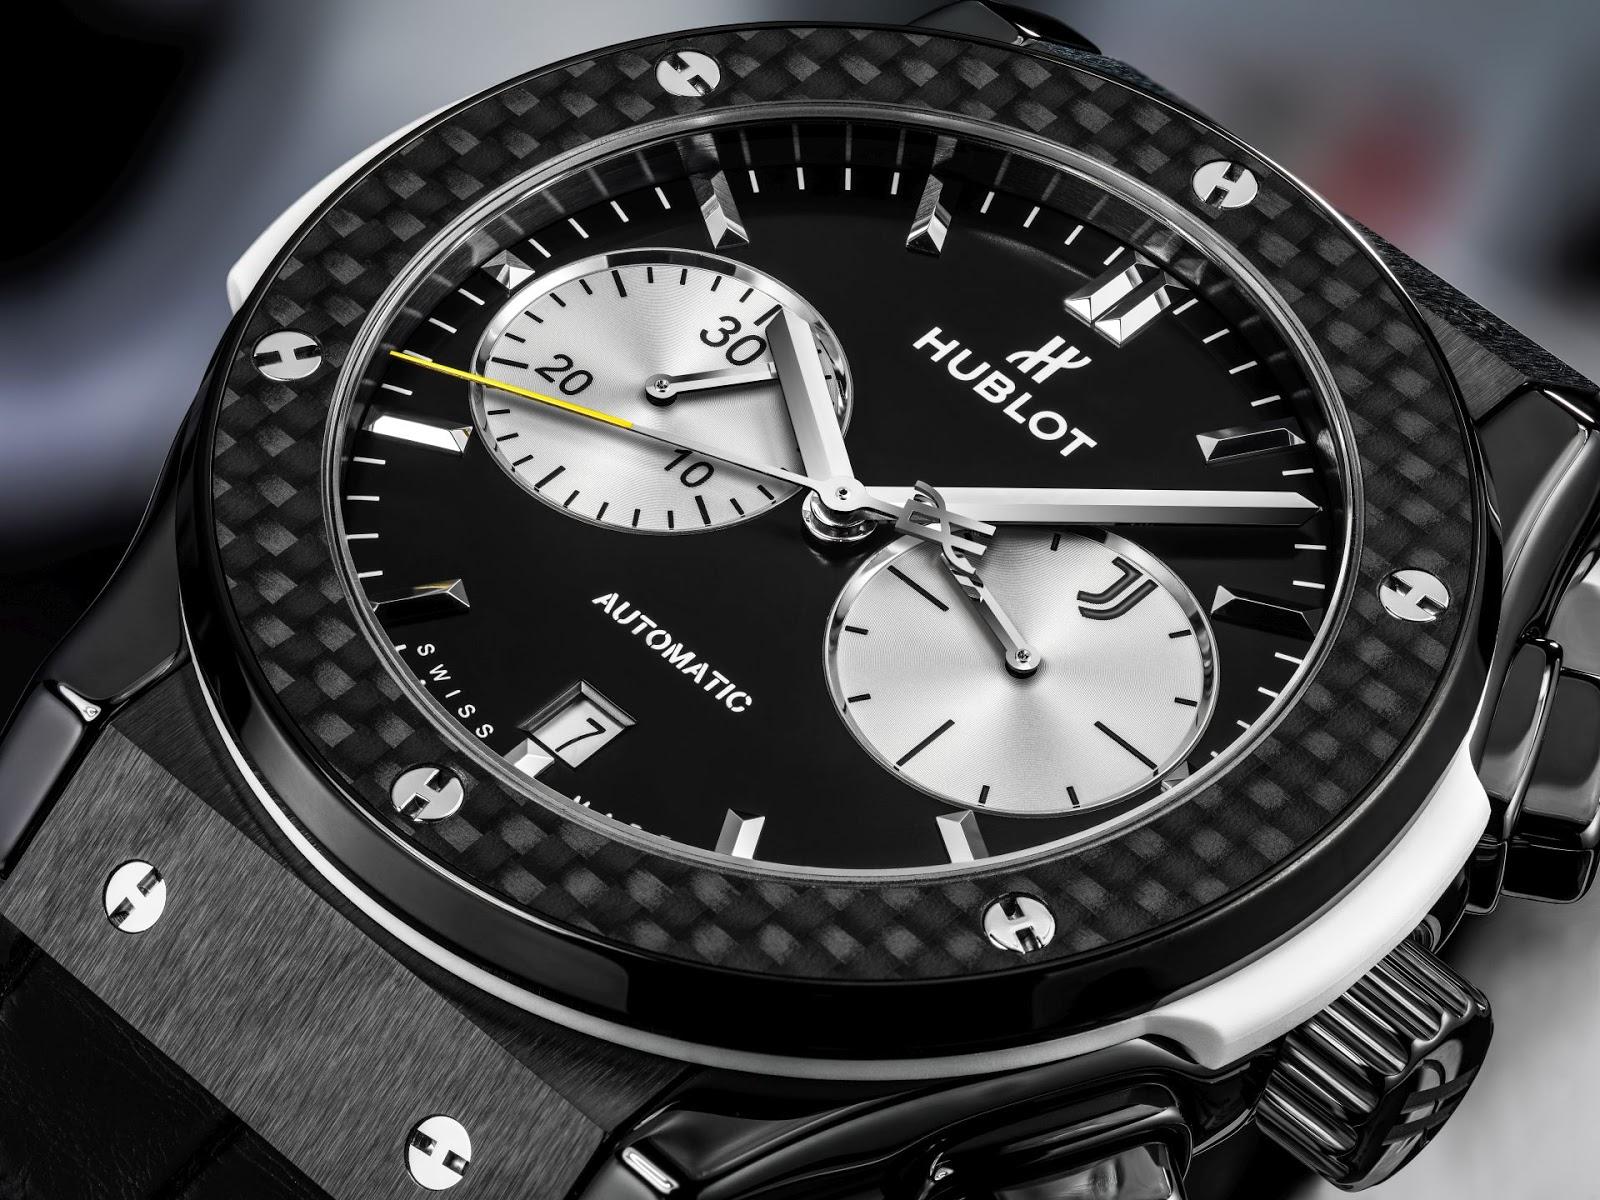 Hublot classic fusion chronograph juventus limited edition